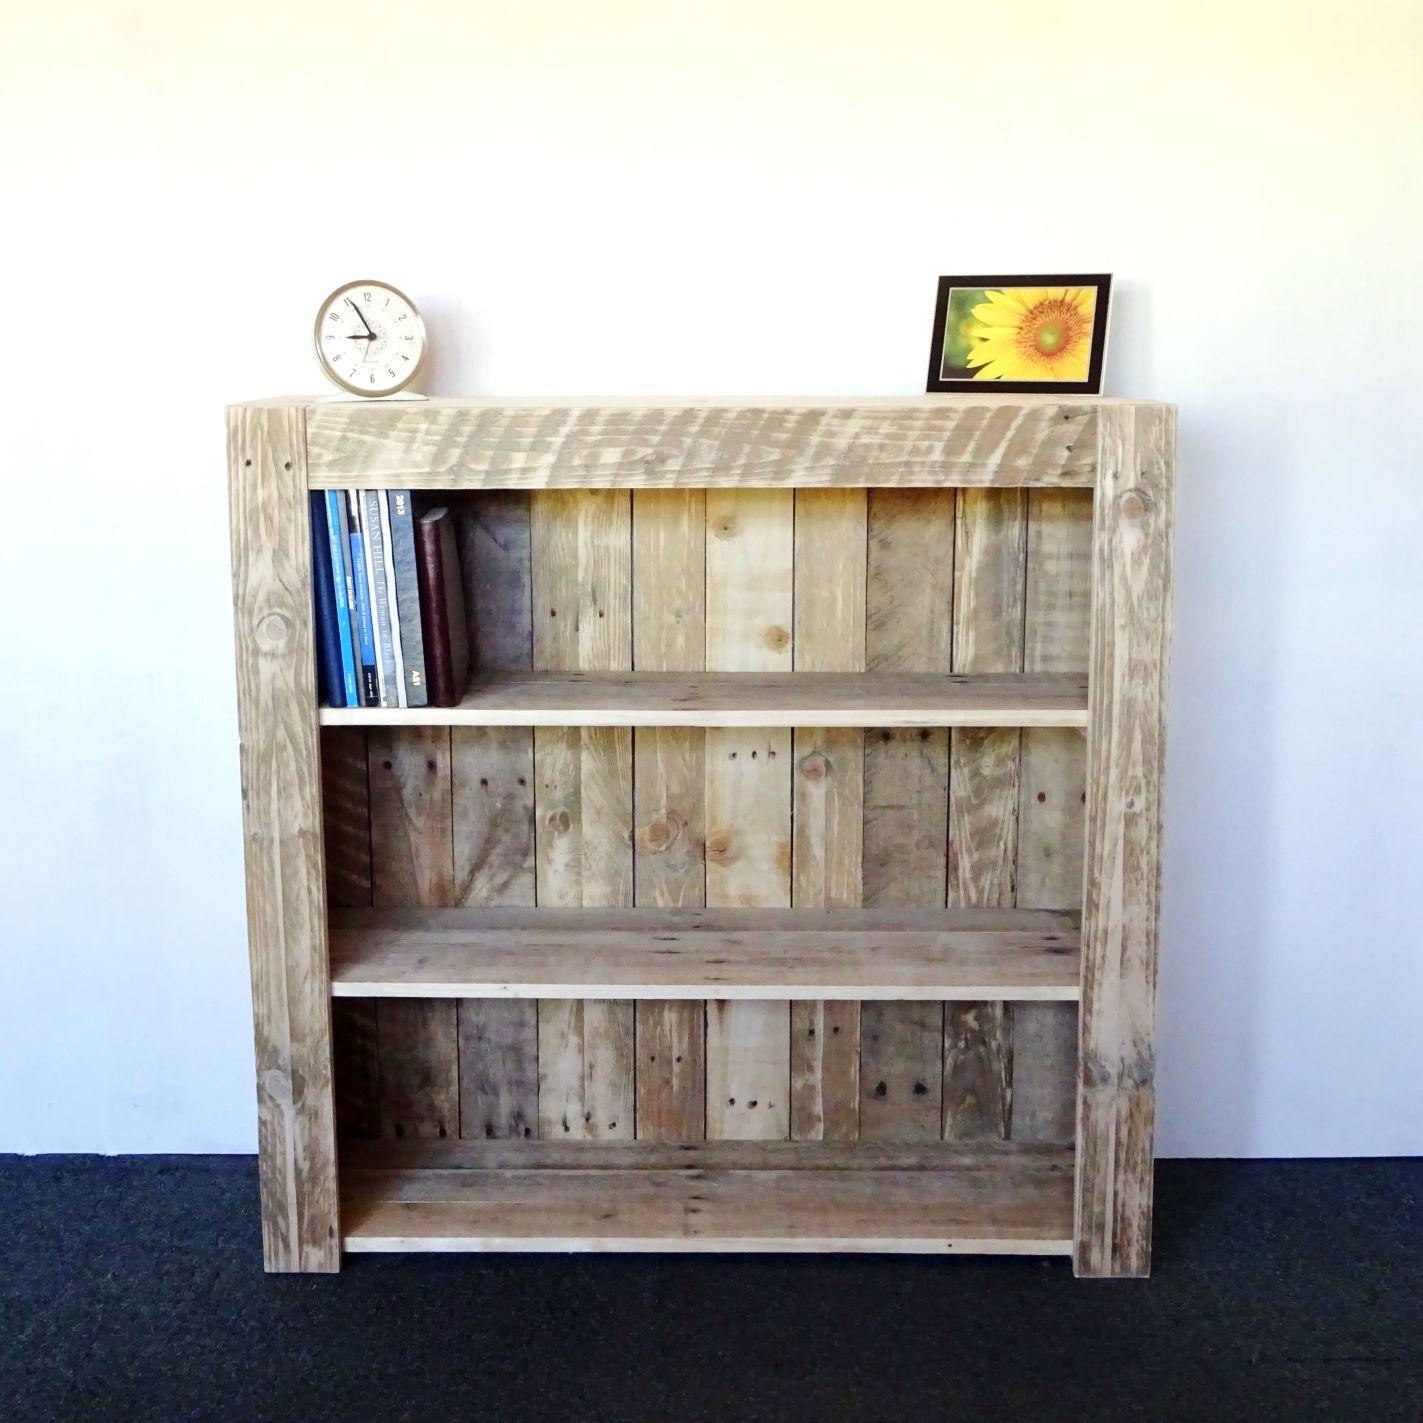 Pallet Bookcase | DIY | Pinterest | Palets, Estanterías y Madera